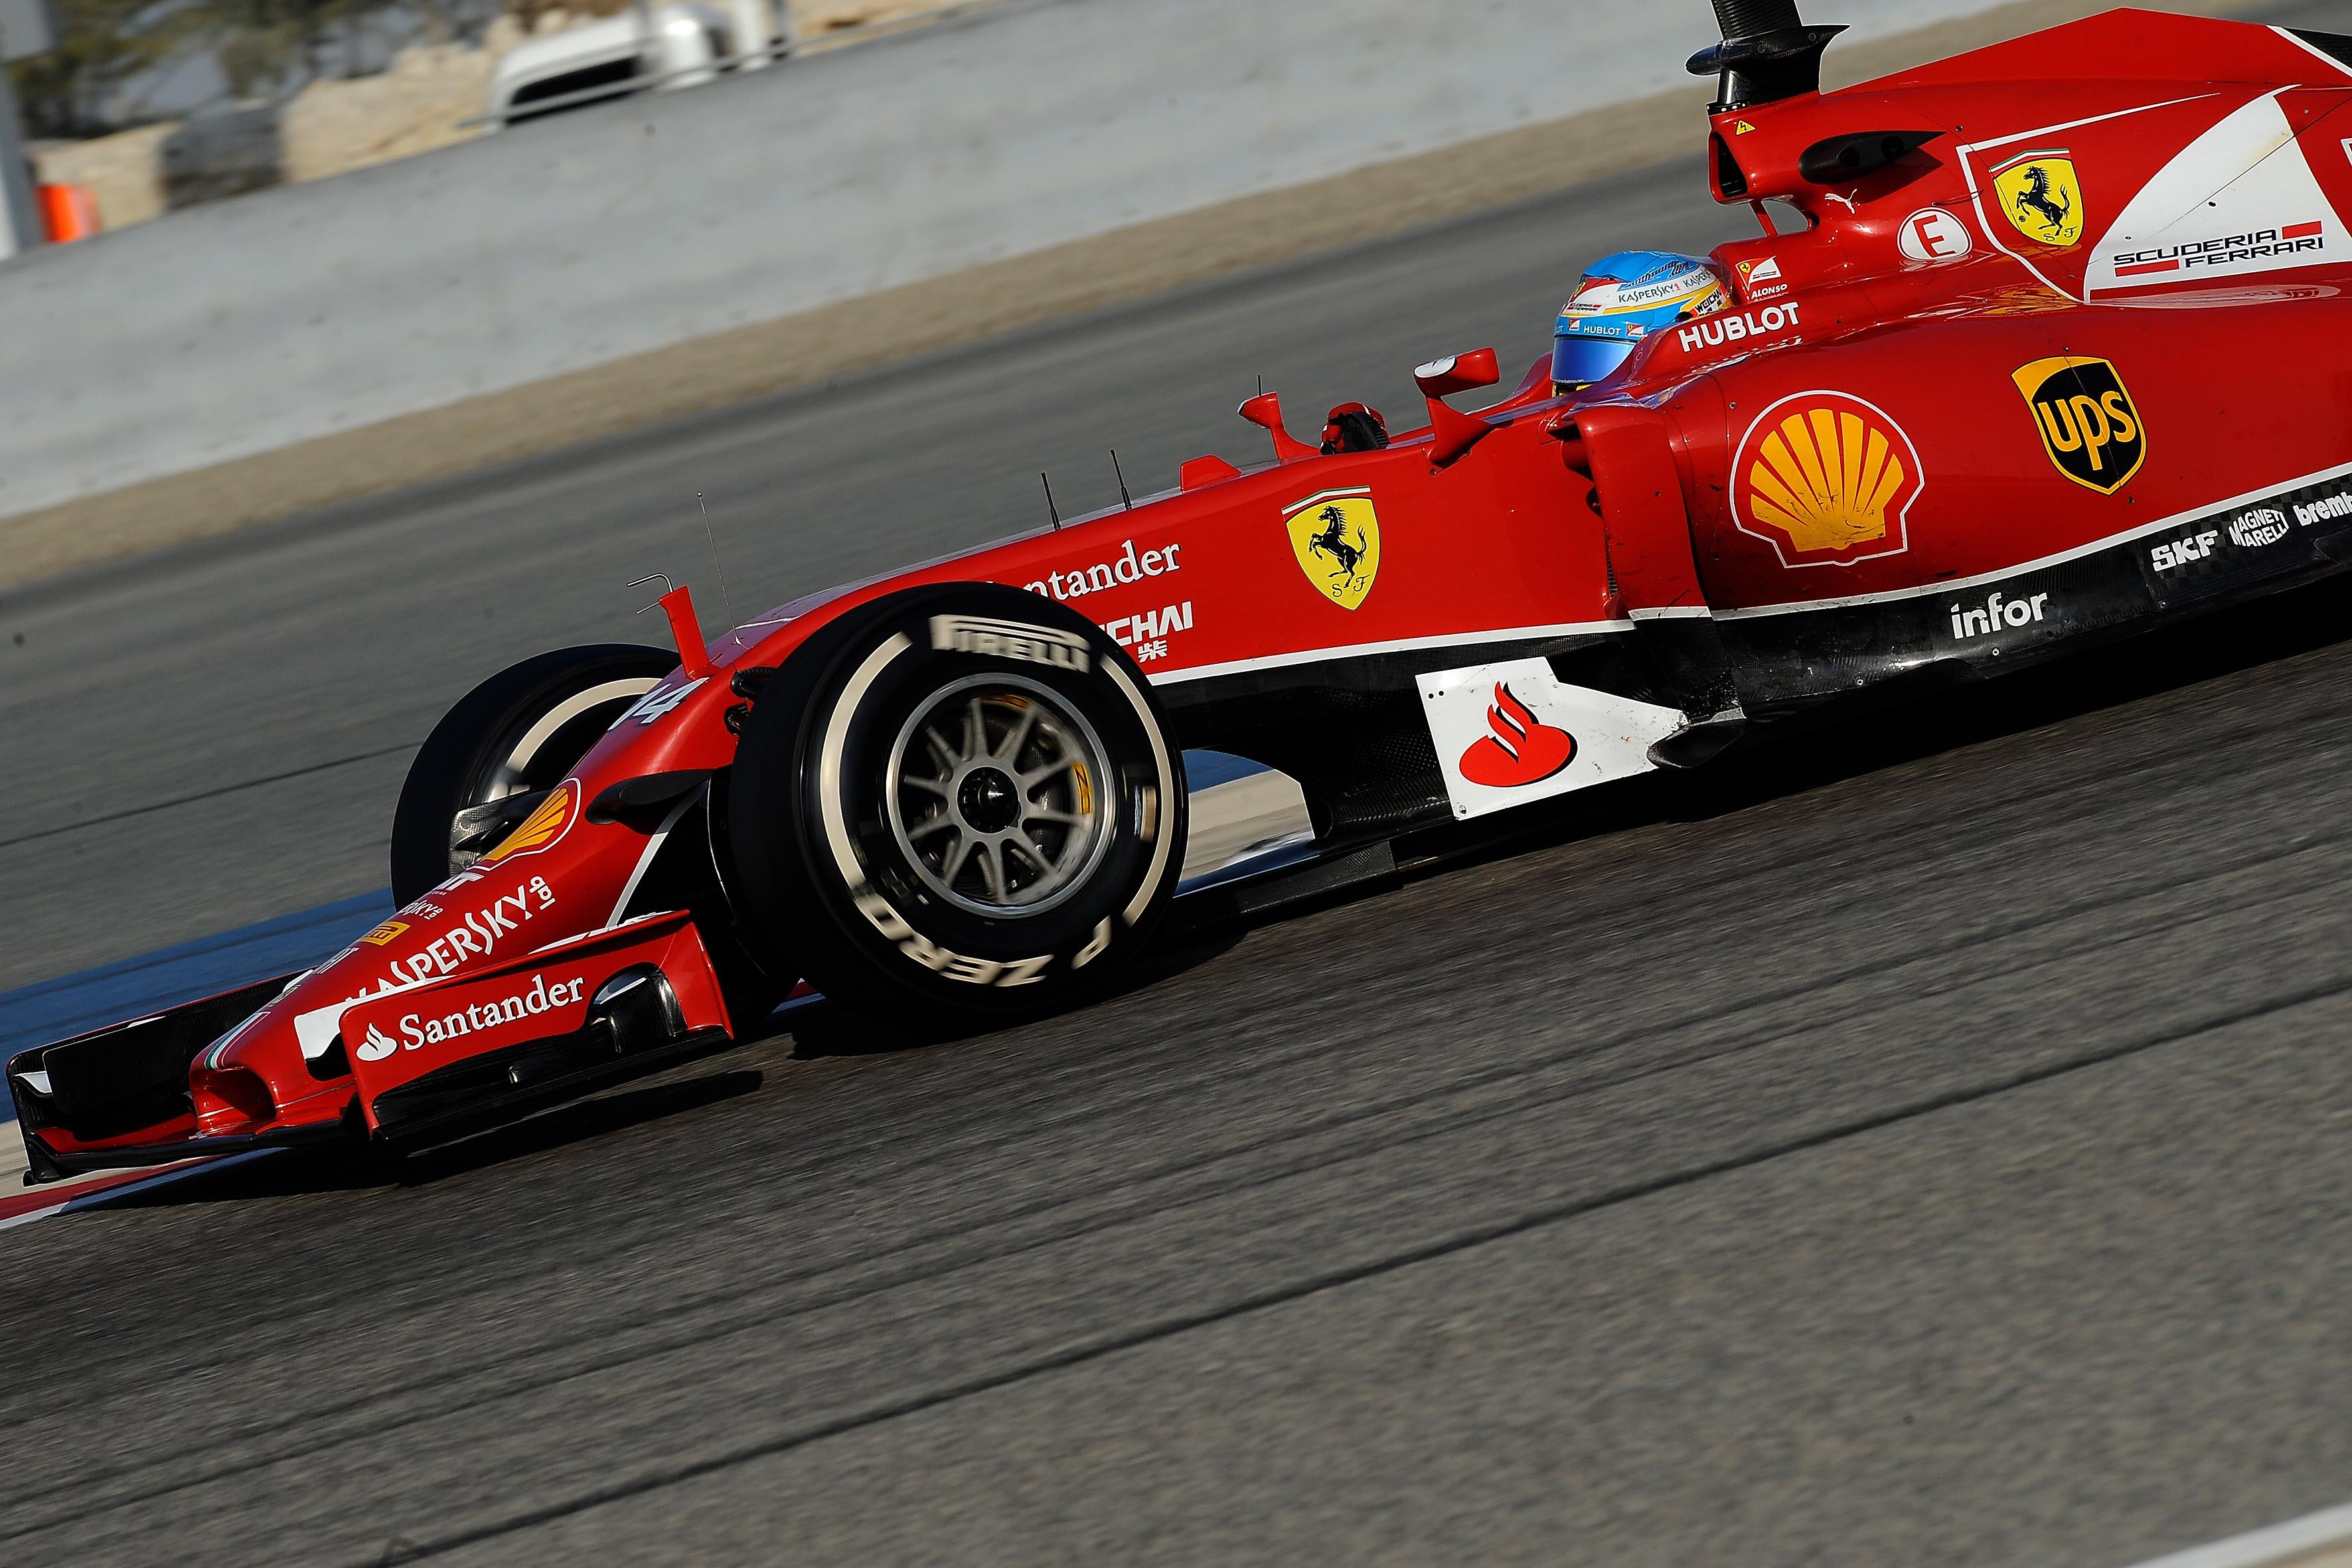 Test in Bahrain: Alonso in pista due giorni